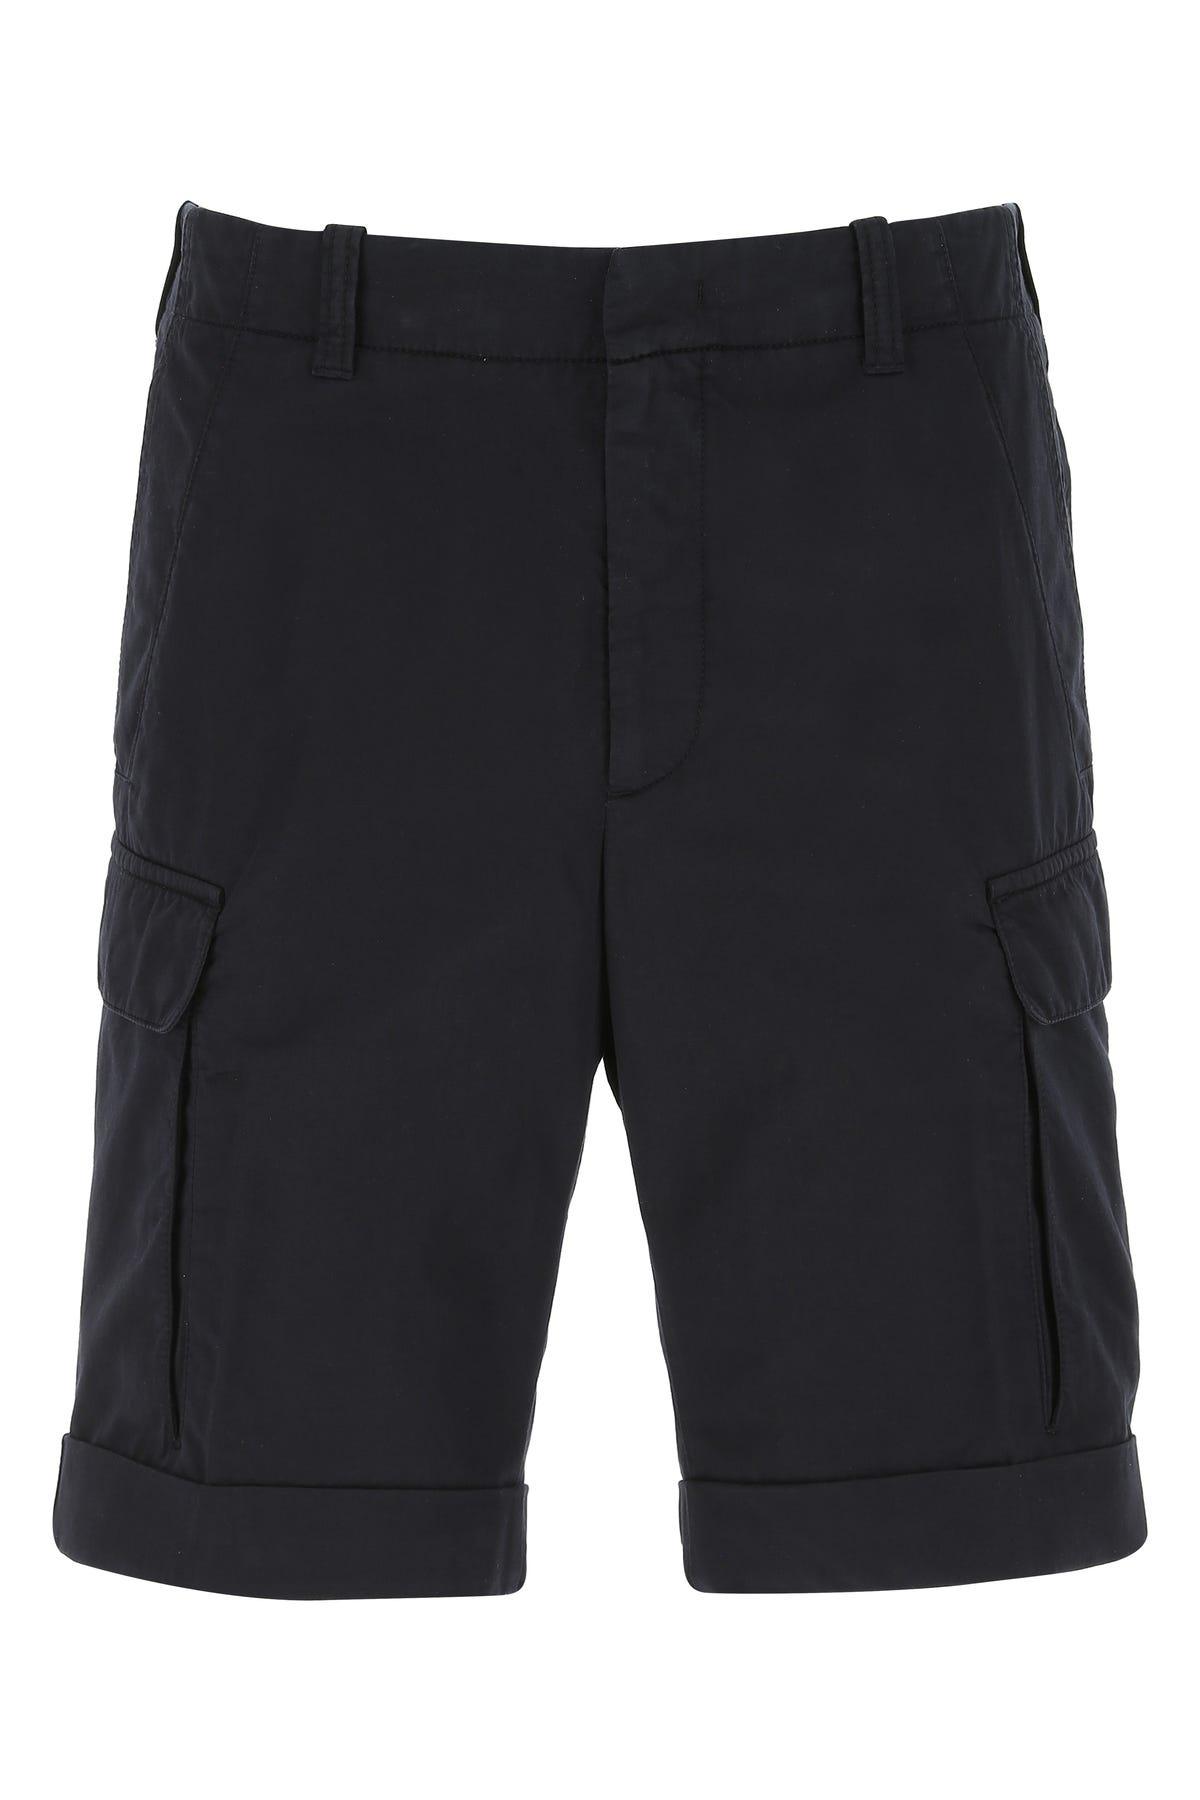 Z Zegna Dove Grey Cotton Blend Bermuda Shorts  Grey  Uomo 48